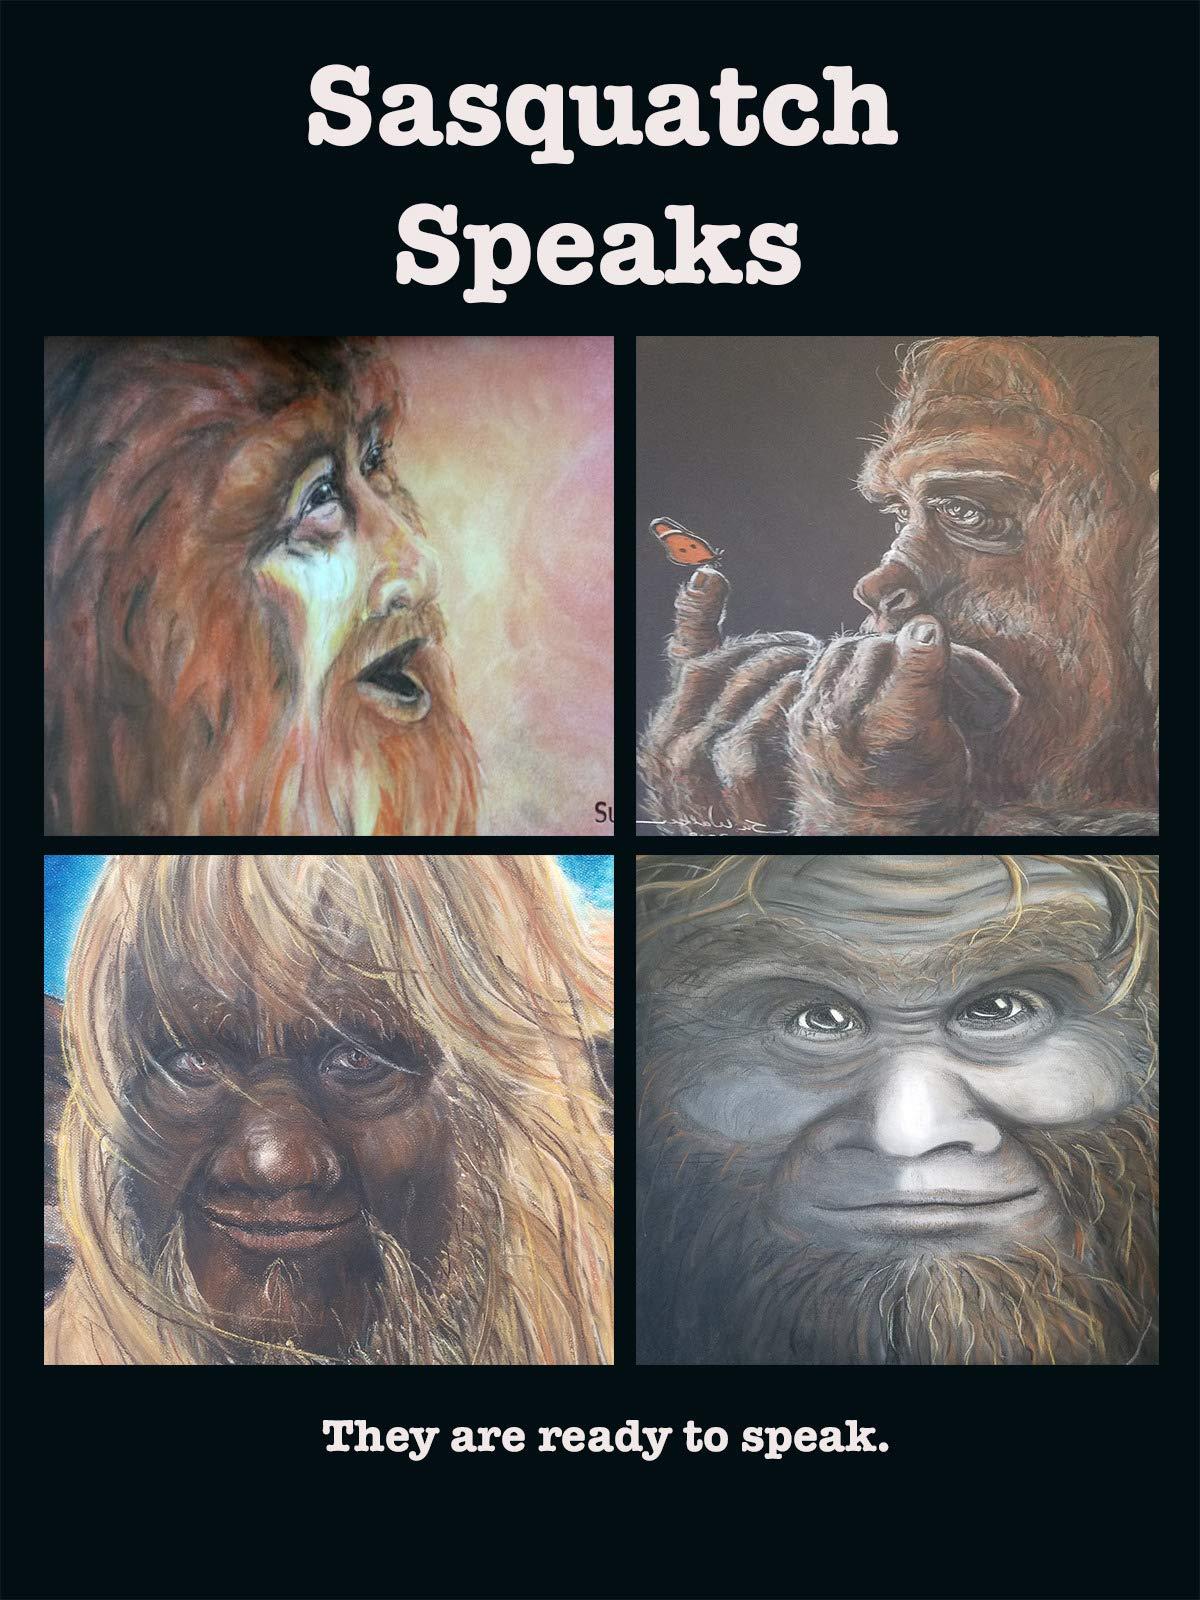 Sasquatch Speaks